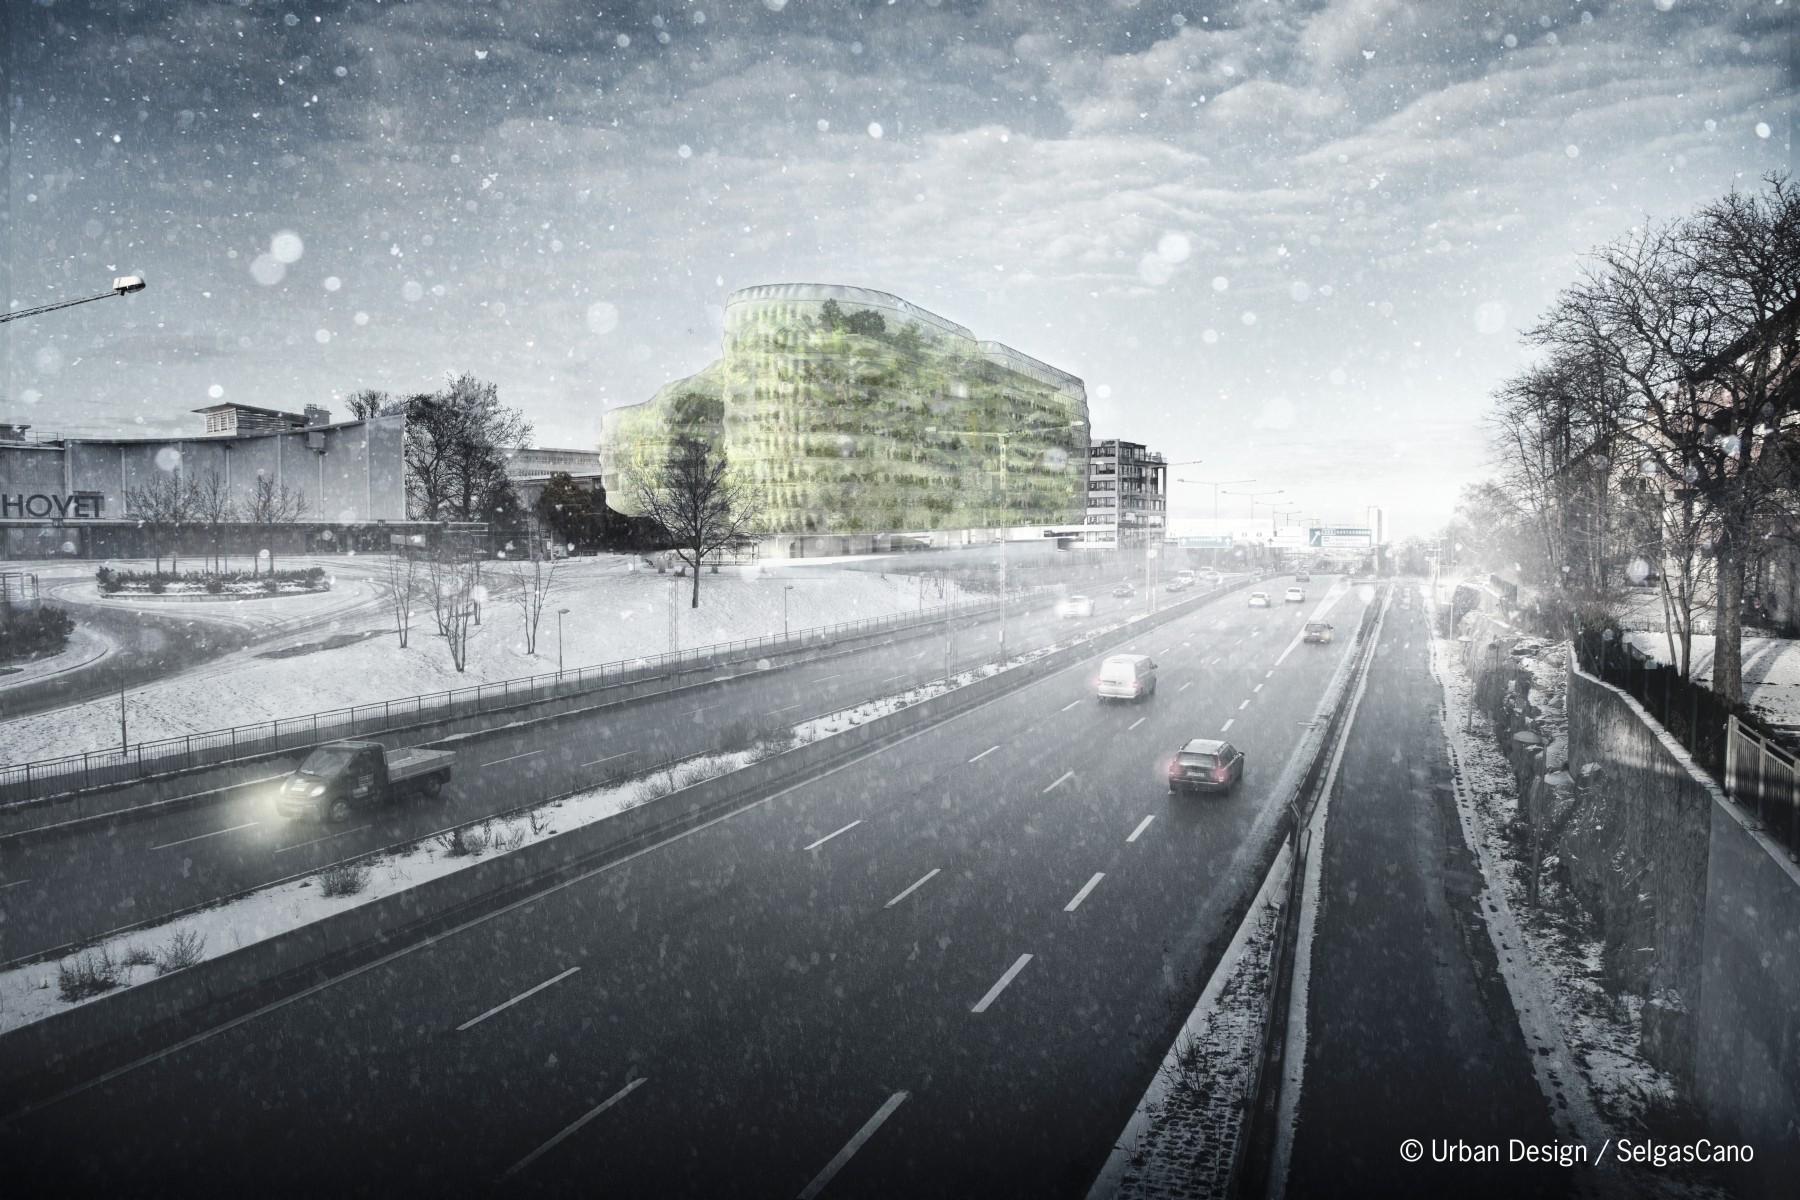 Tekniska_Namndhuset_LAND_2014_perspektiv_1